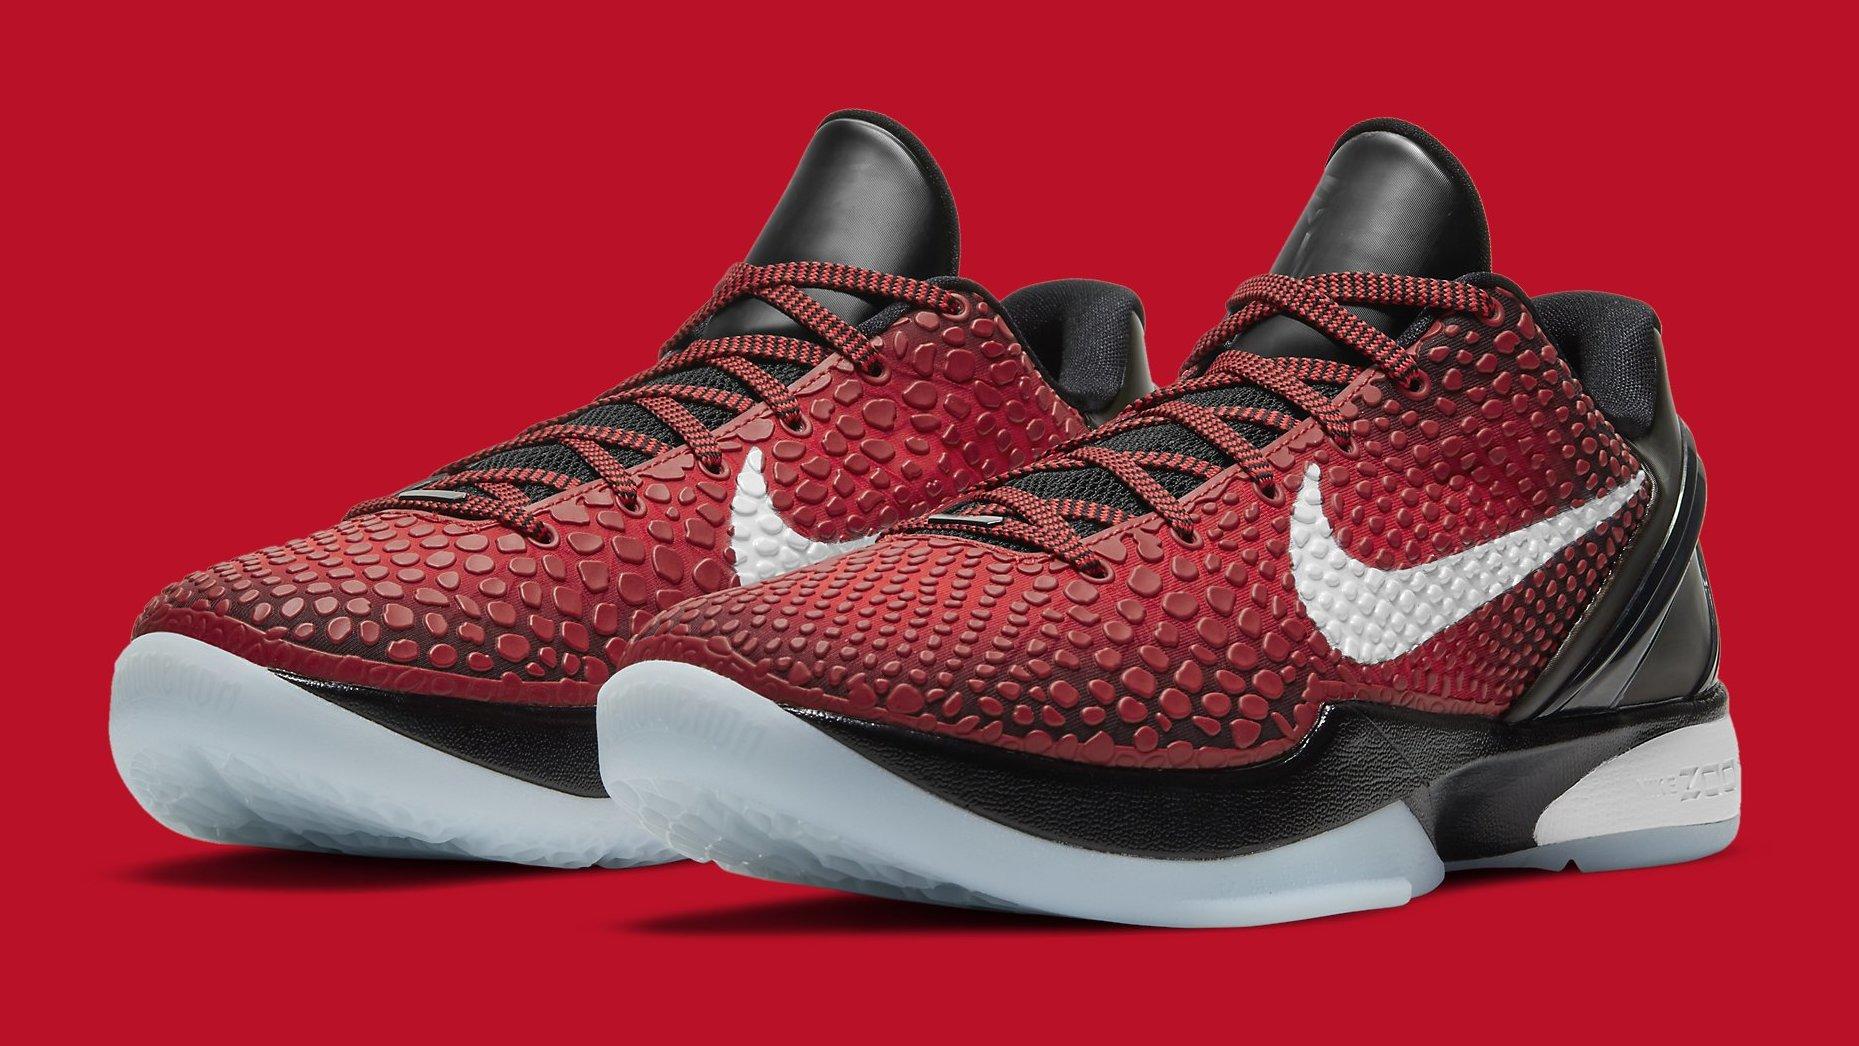 Nike Zoom Kobe 6 Protro Challenge Red/Black/White DH9888-600 ...